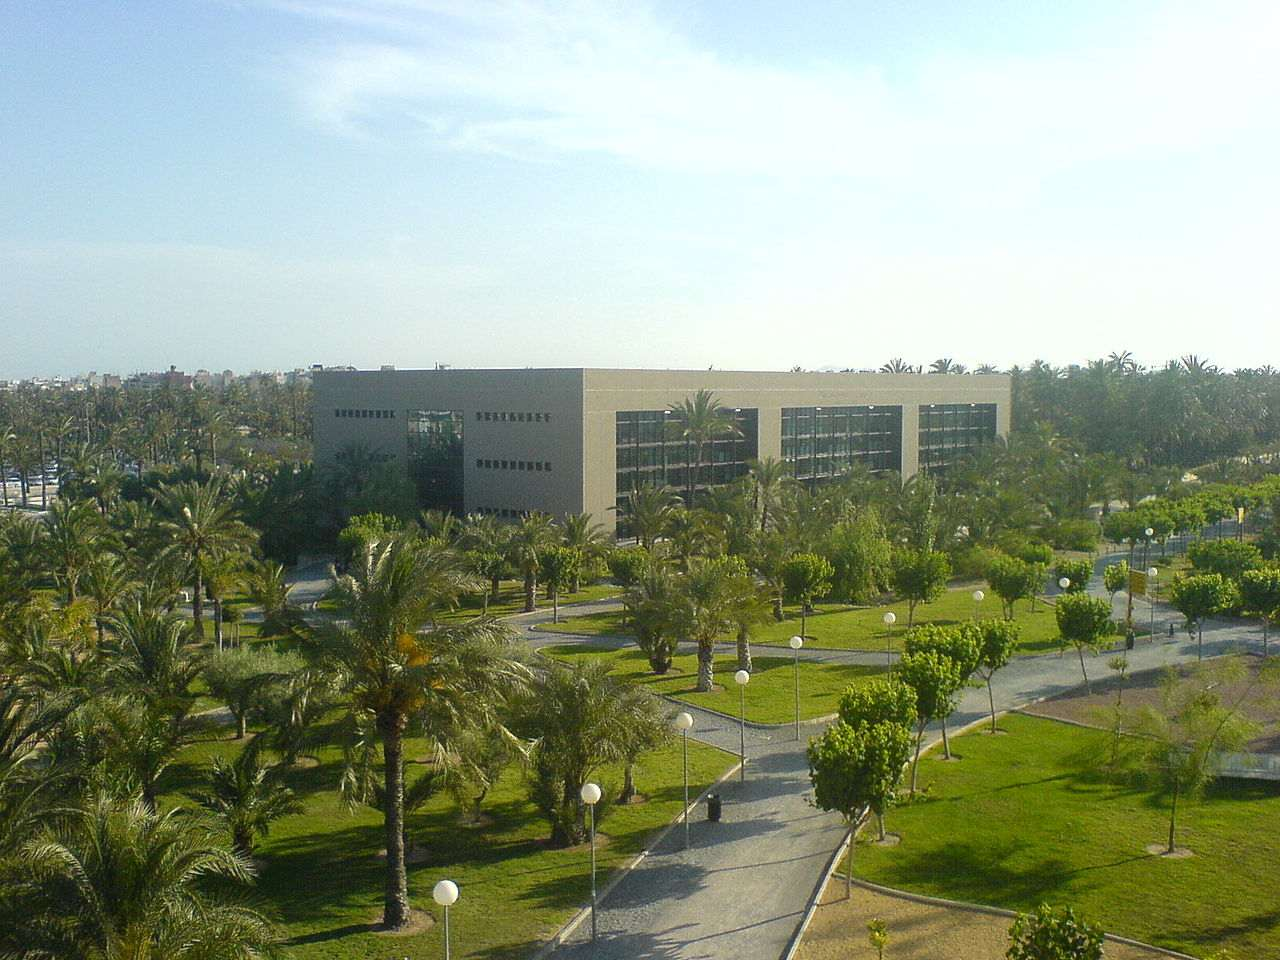 Universidad-Miguel-Hernandez-en-Elche-Josecarlosdiez-wiki.JPG